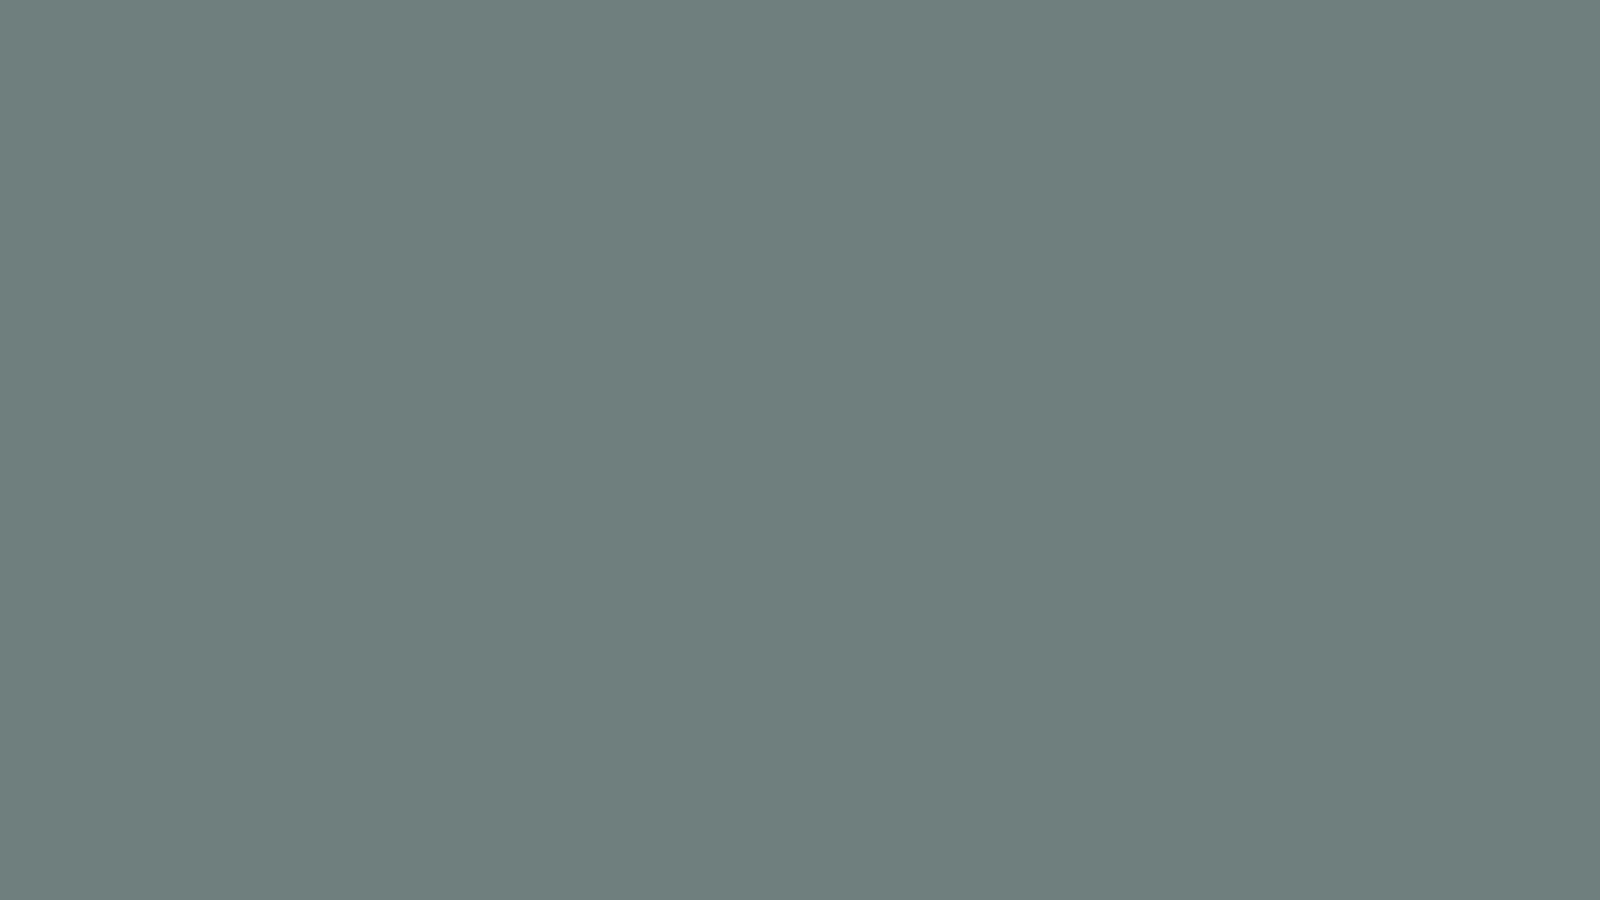 1600x900 AuroMetalSaurus Solid Color Background